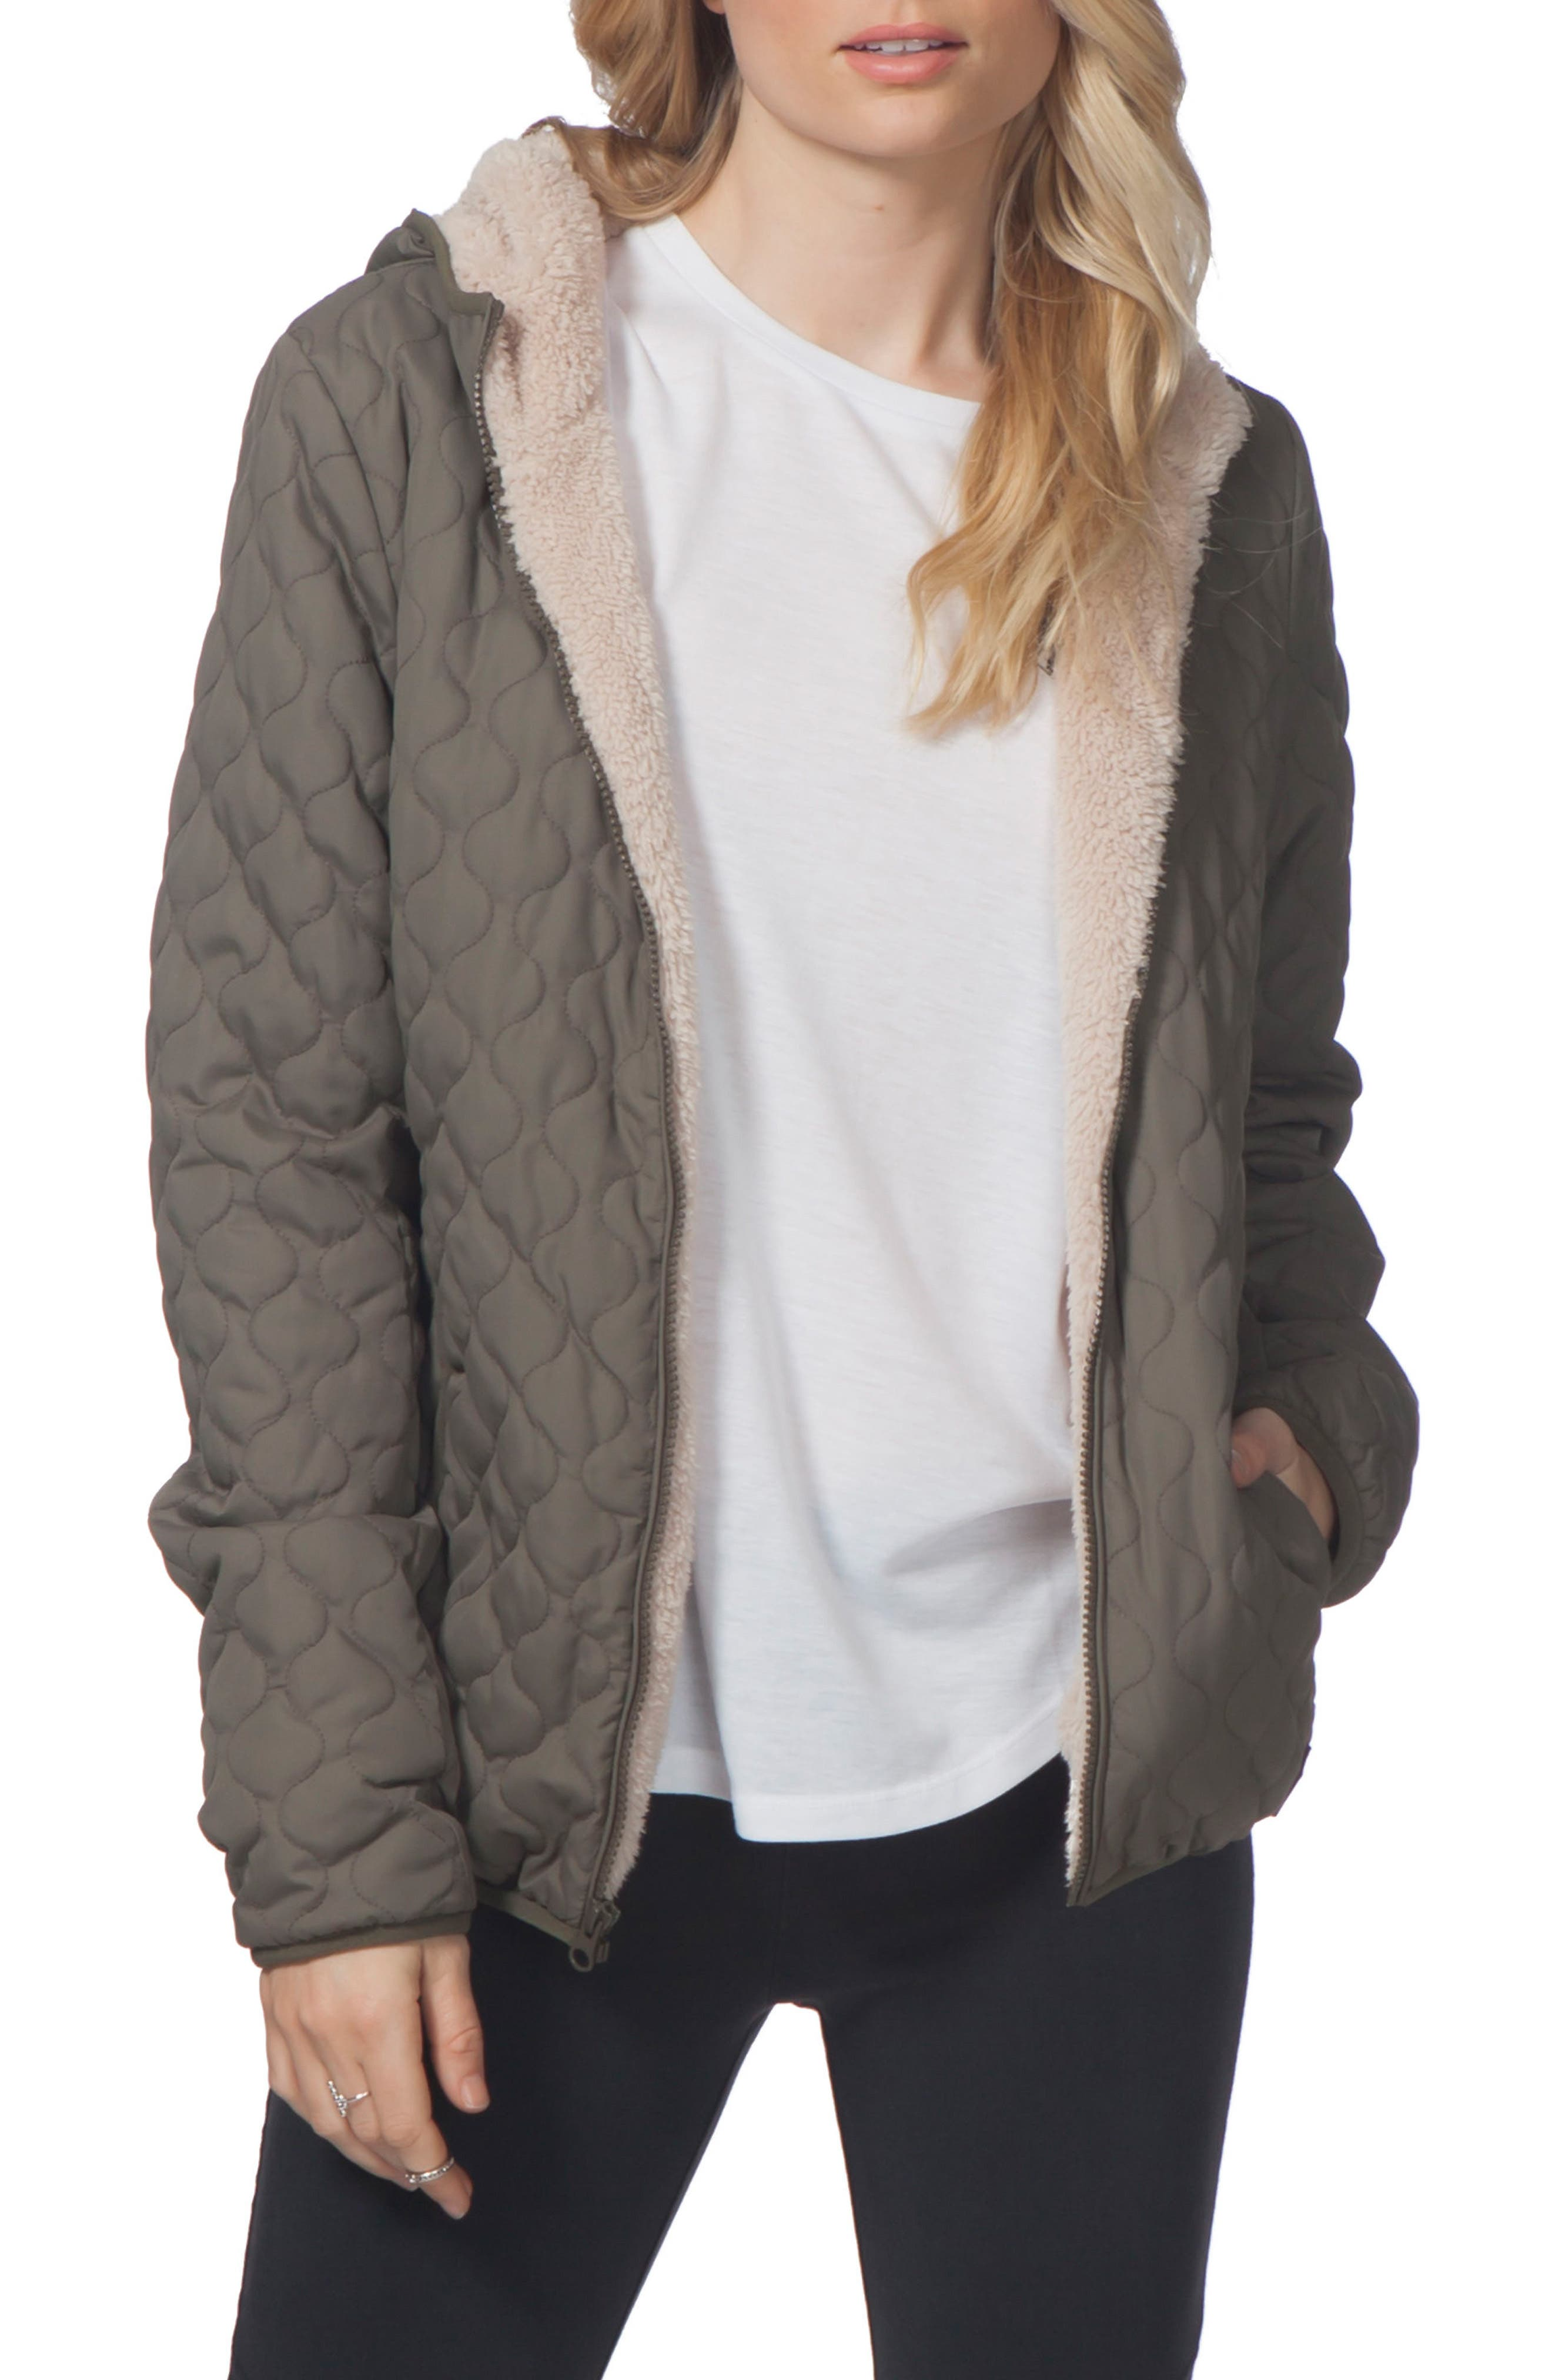 Anoeta Anti Series Jacket,                         Main,                         color, Army